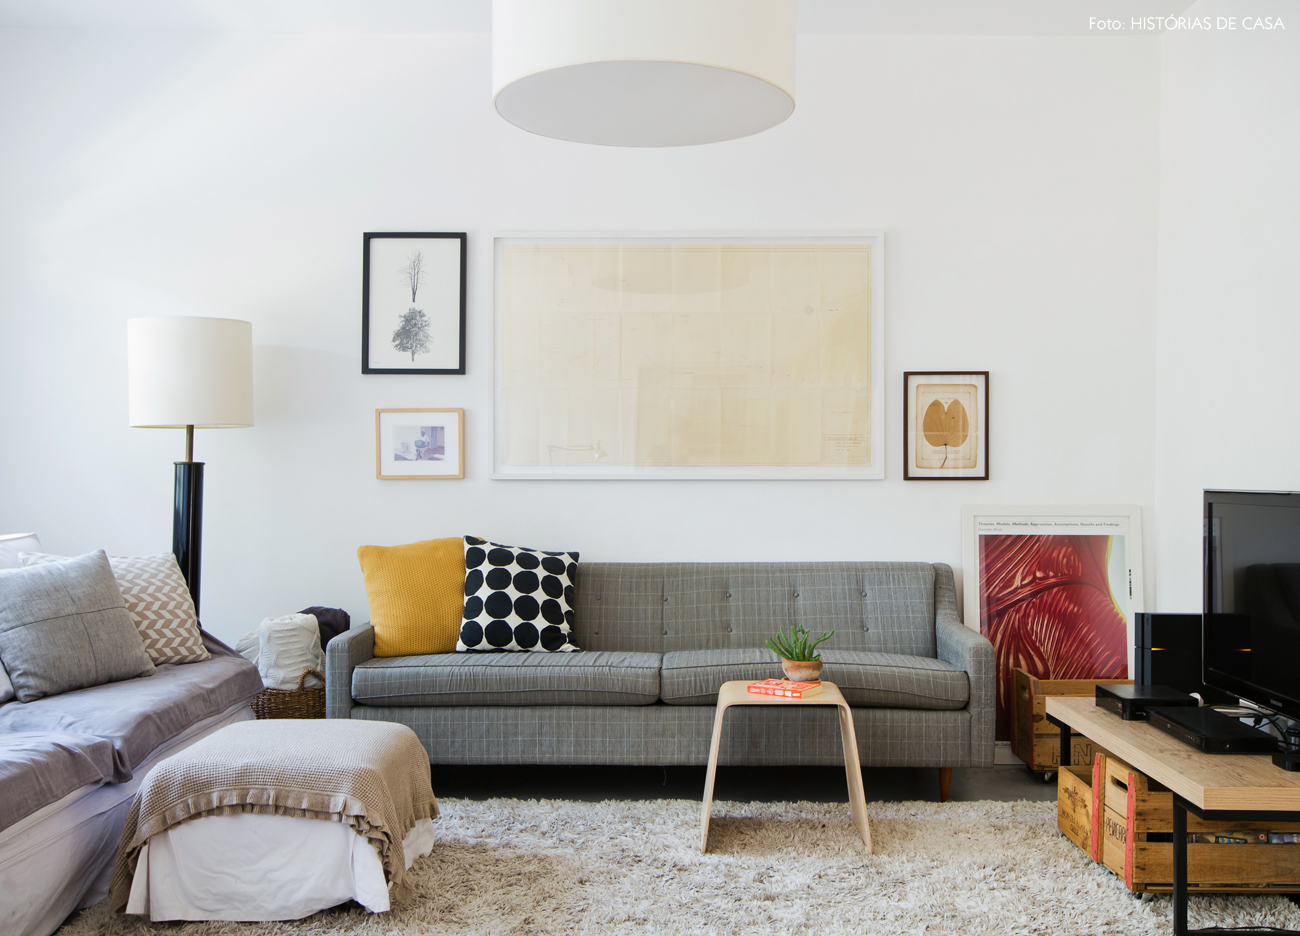 13-decoracao-sala-estar-sofa-cinza-estampado-caixote-madeira